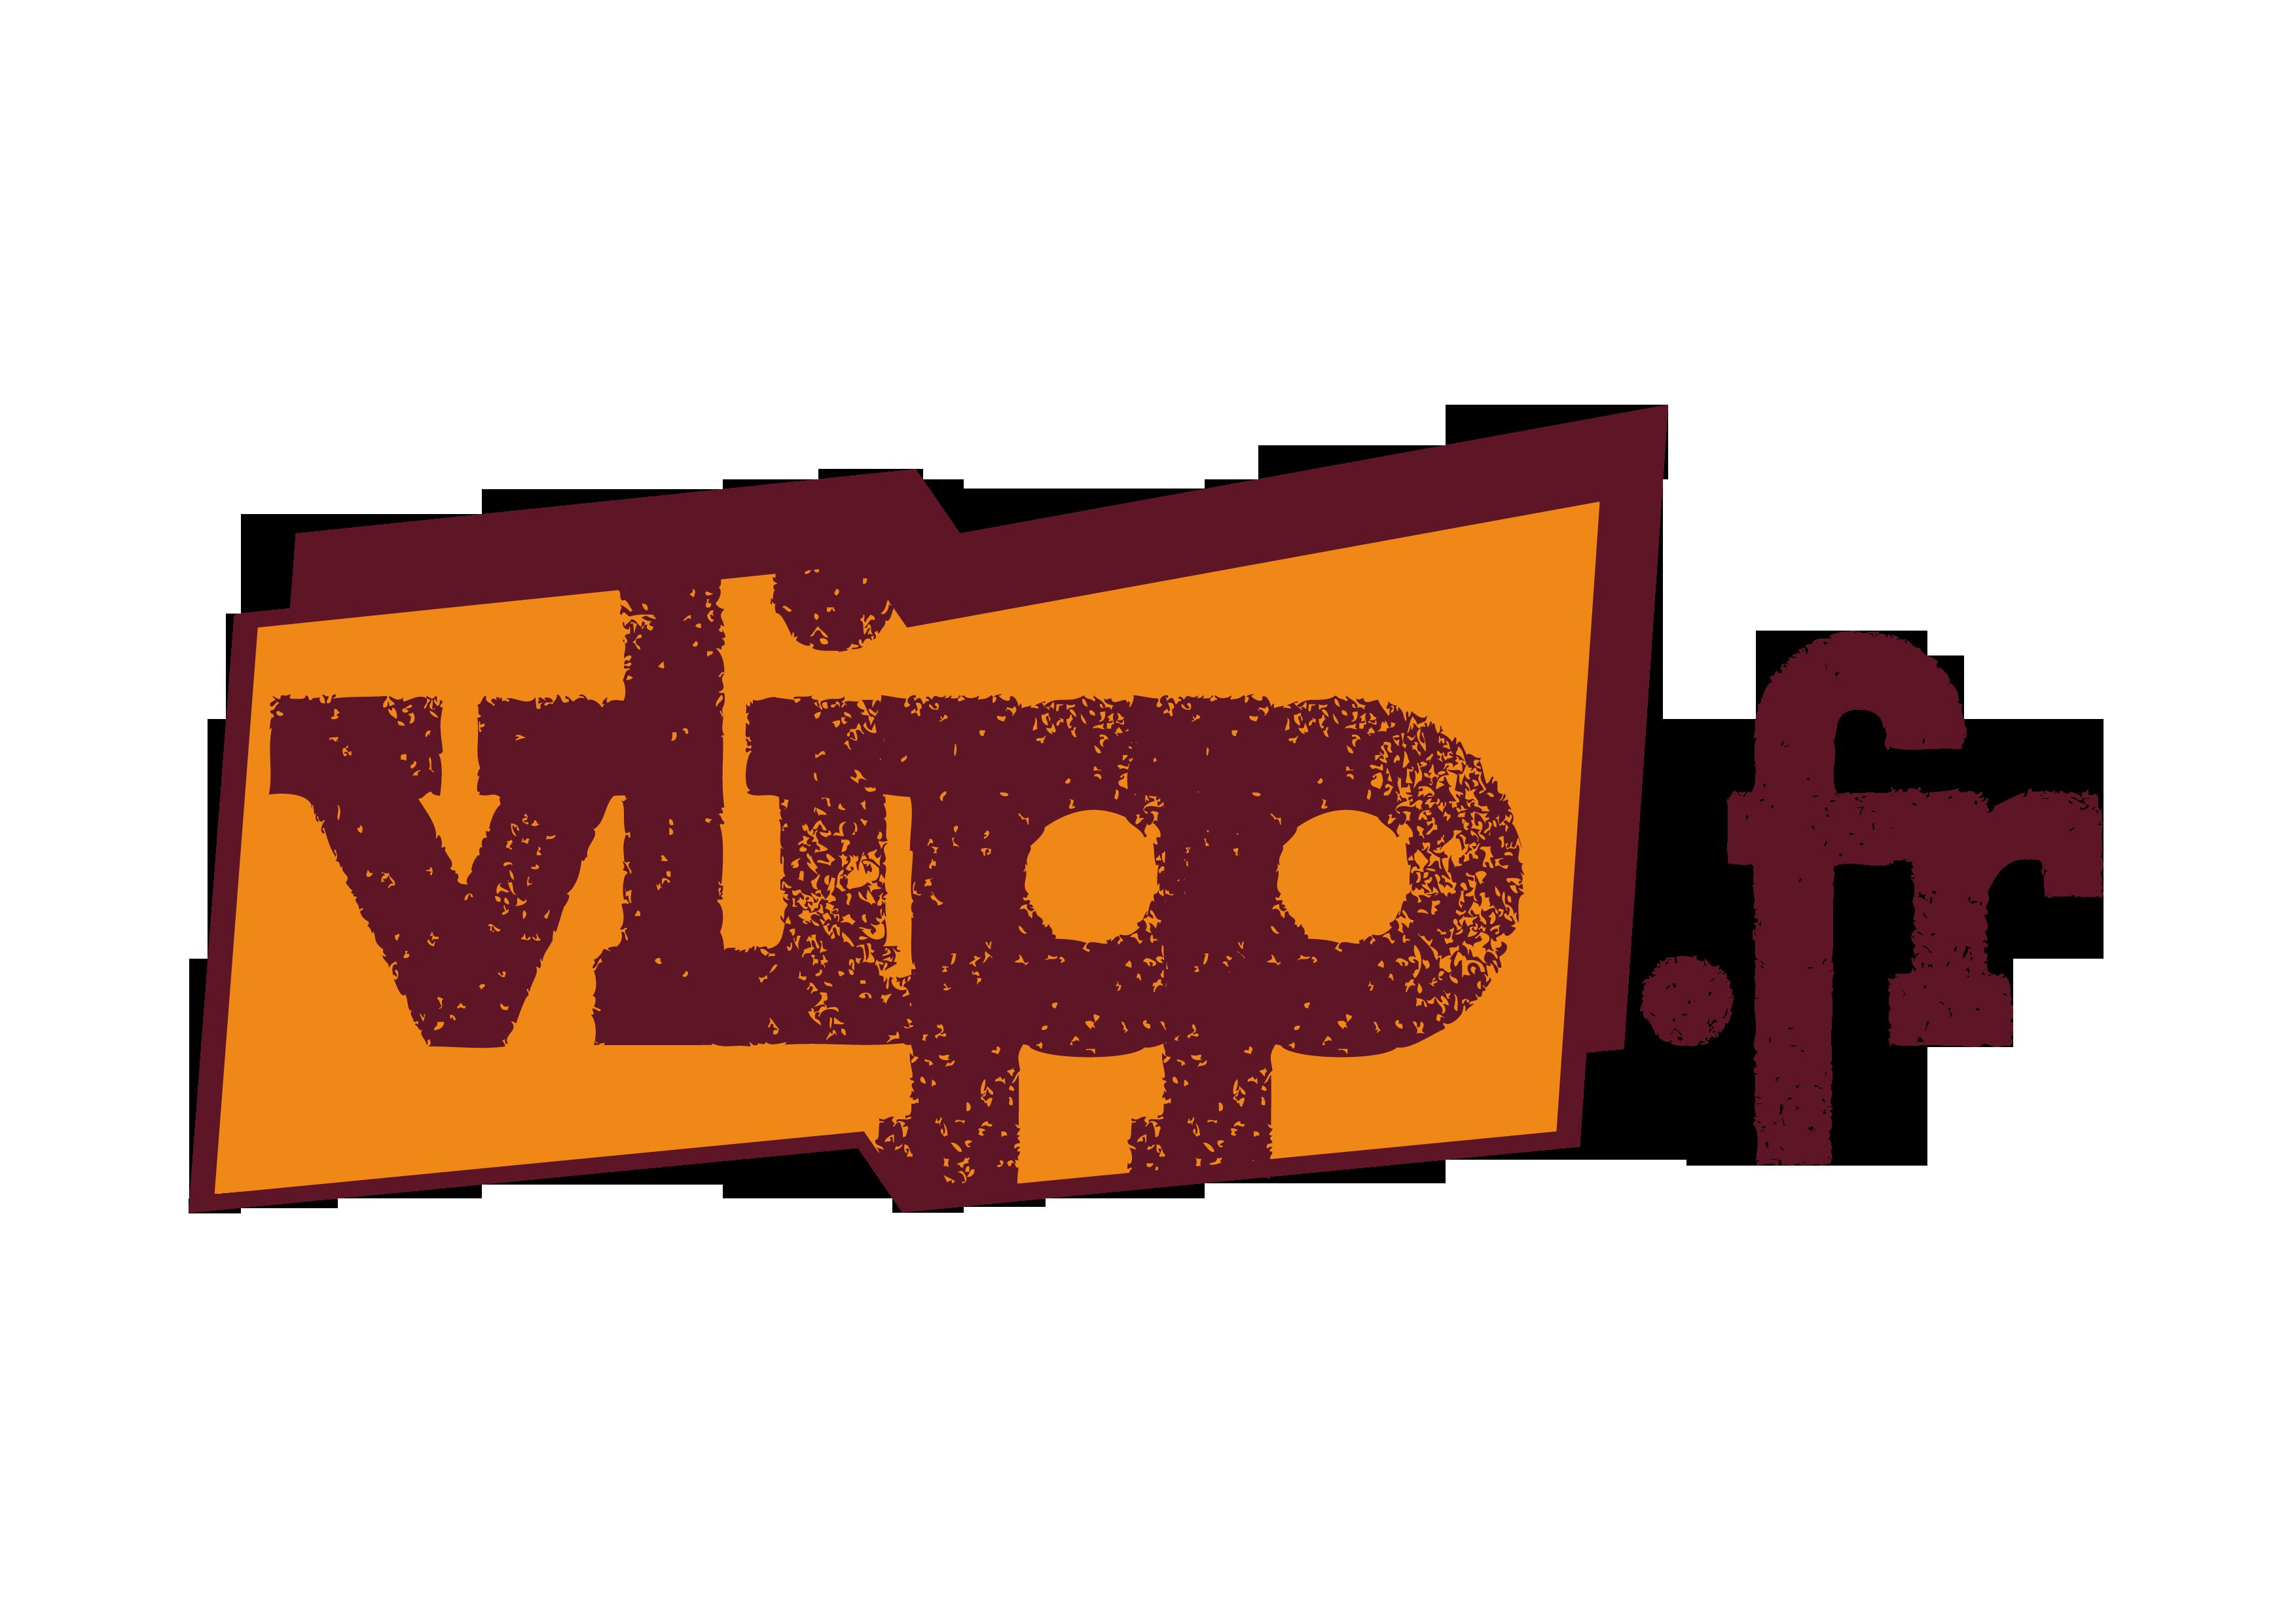 vlipp.fr